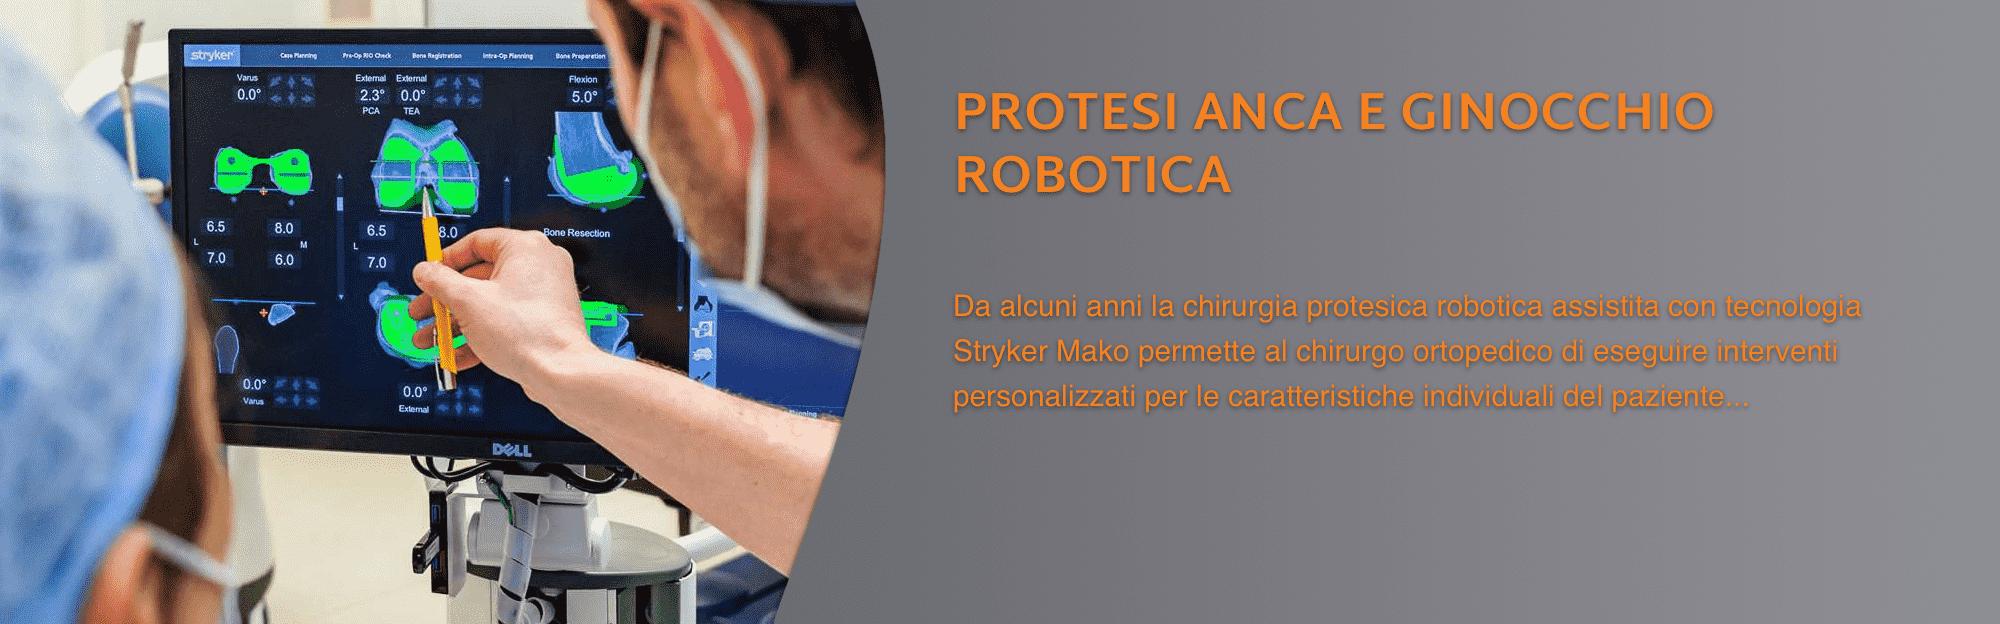 protesi robotica anca ginocchio